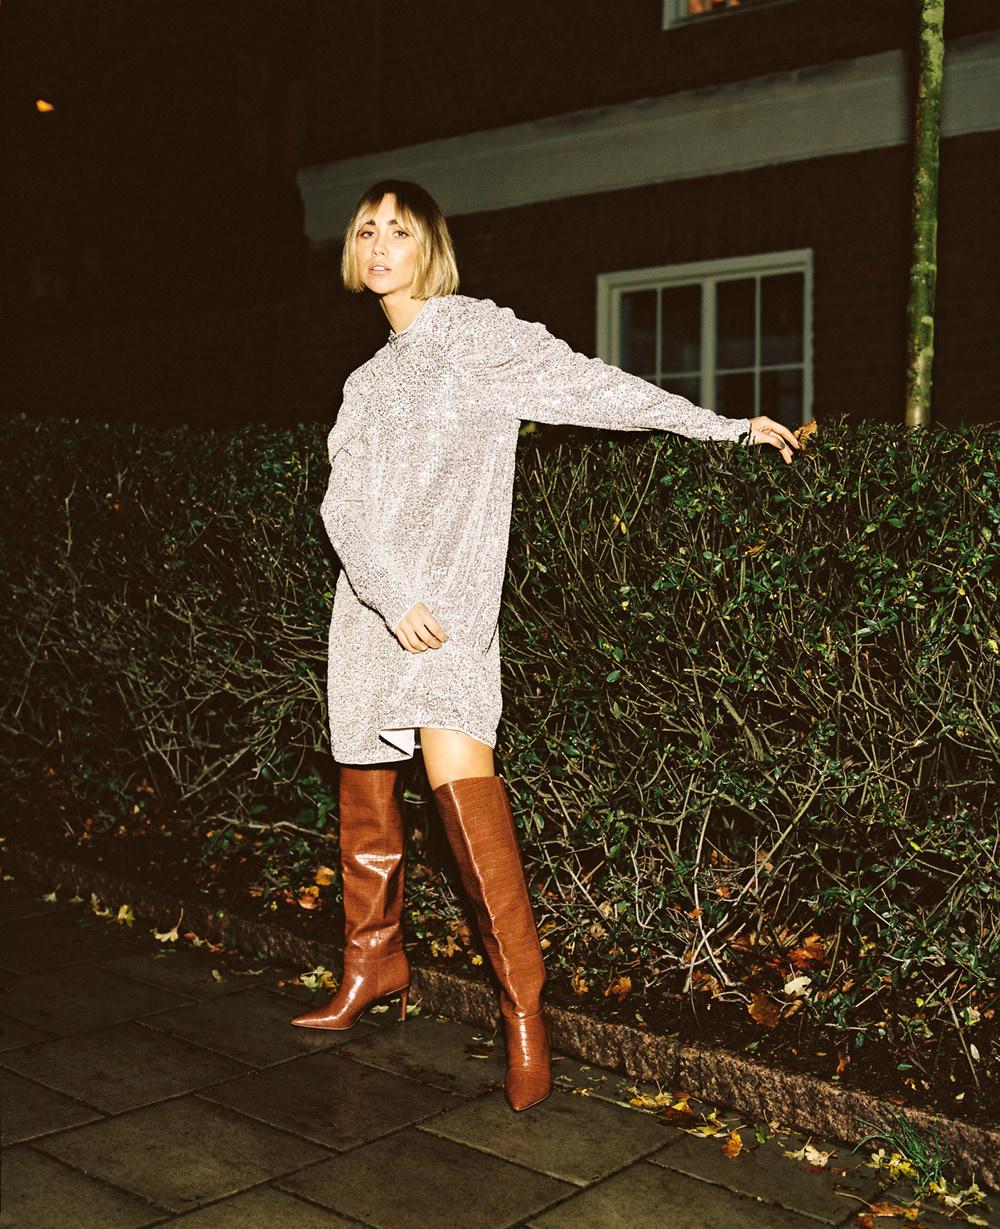 ad analog bildbehandling commercial Fashion  Film   Mamiya Photography  Post Production retouch